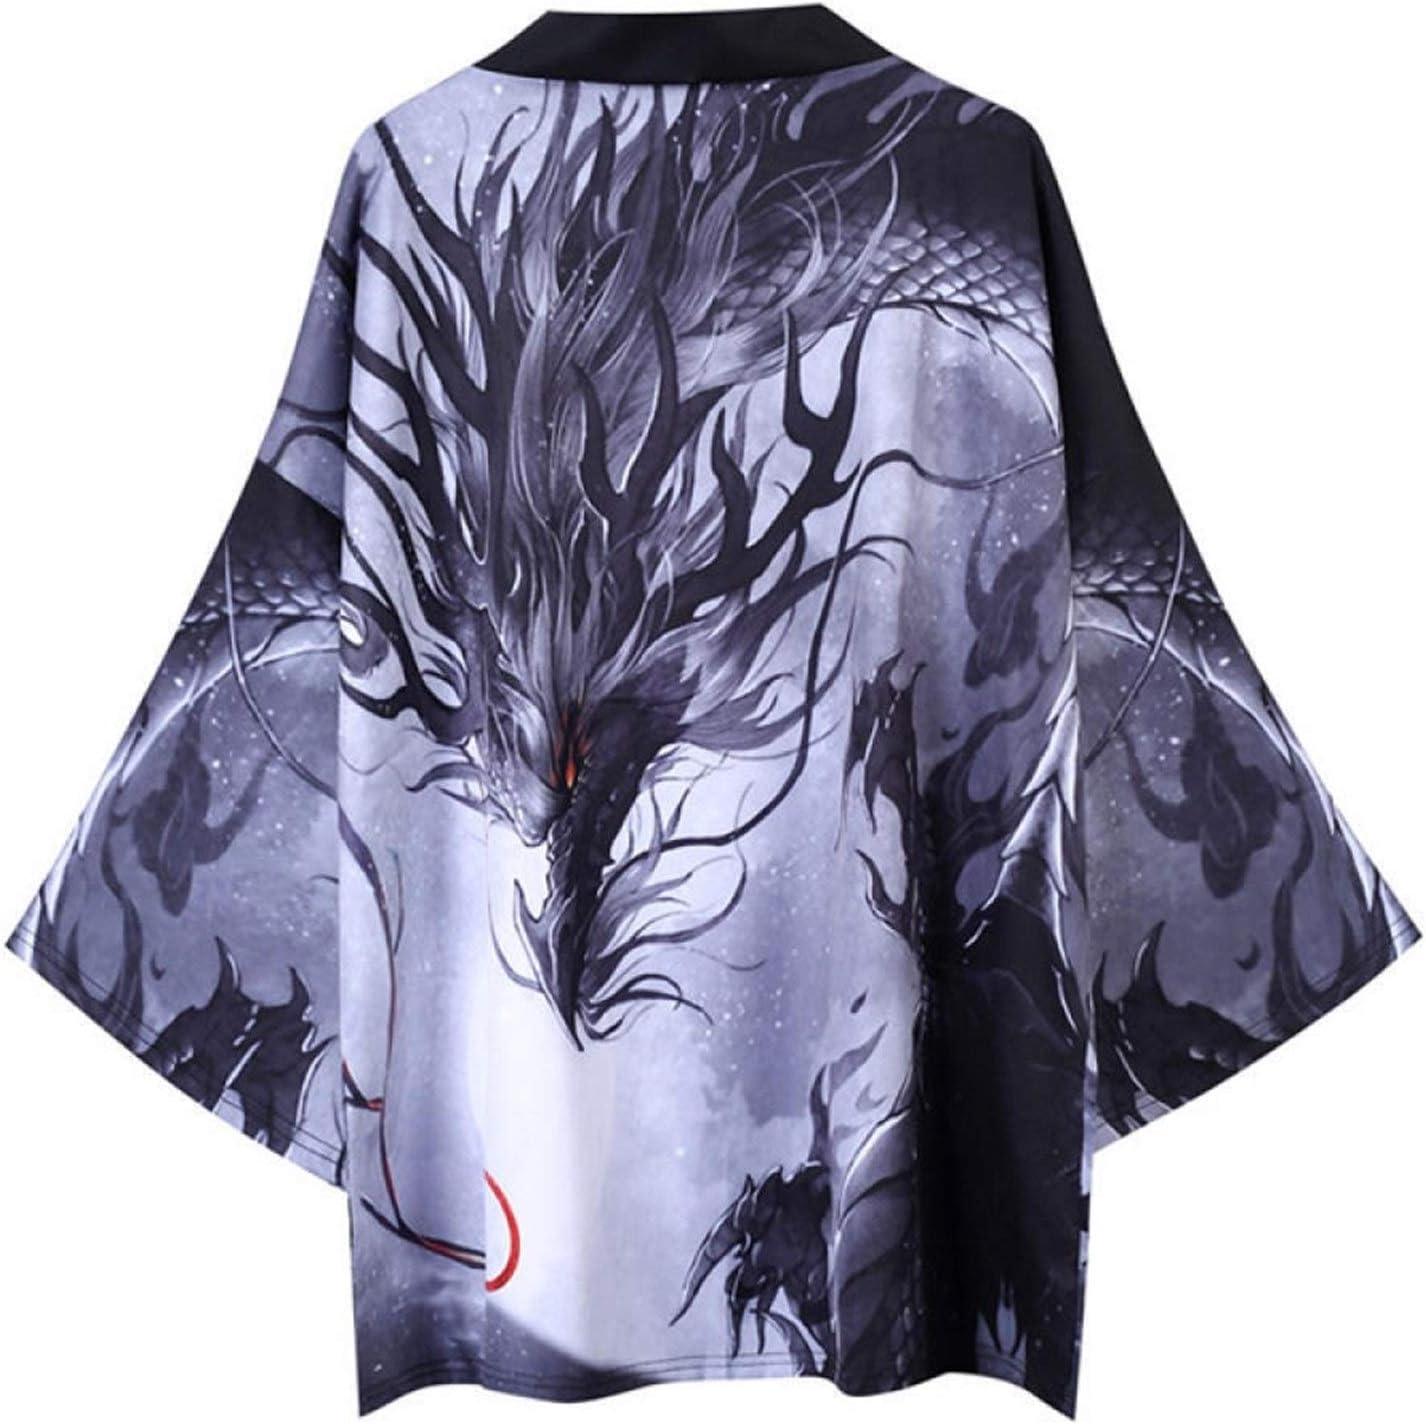 SHUYANshiyu Japanese Retro Dark Dragon Robe Hanfu Men's and Women's Loose Robe Coat (Color : 1, Size : XXL)